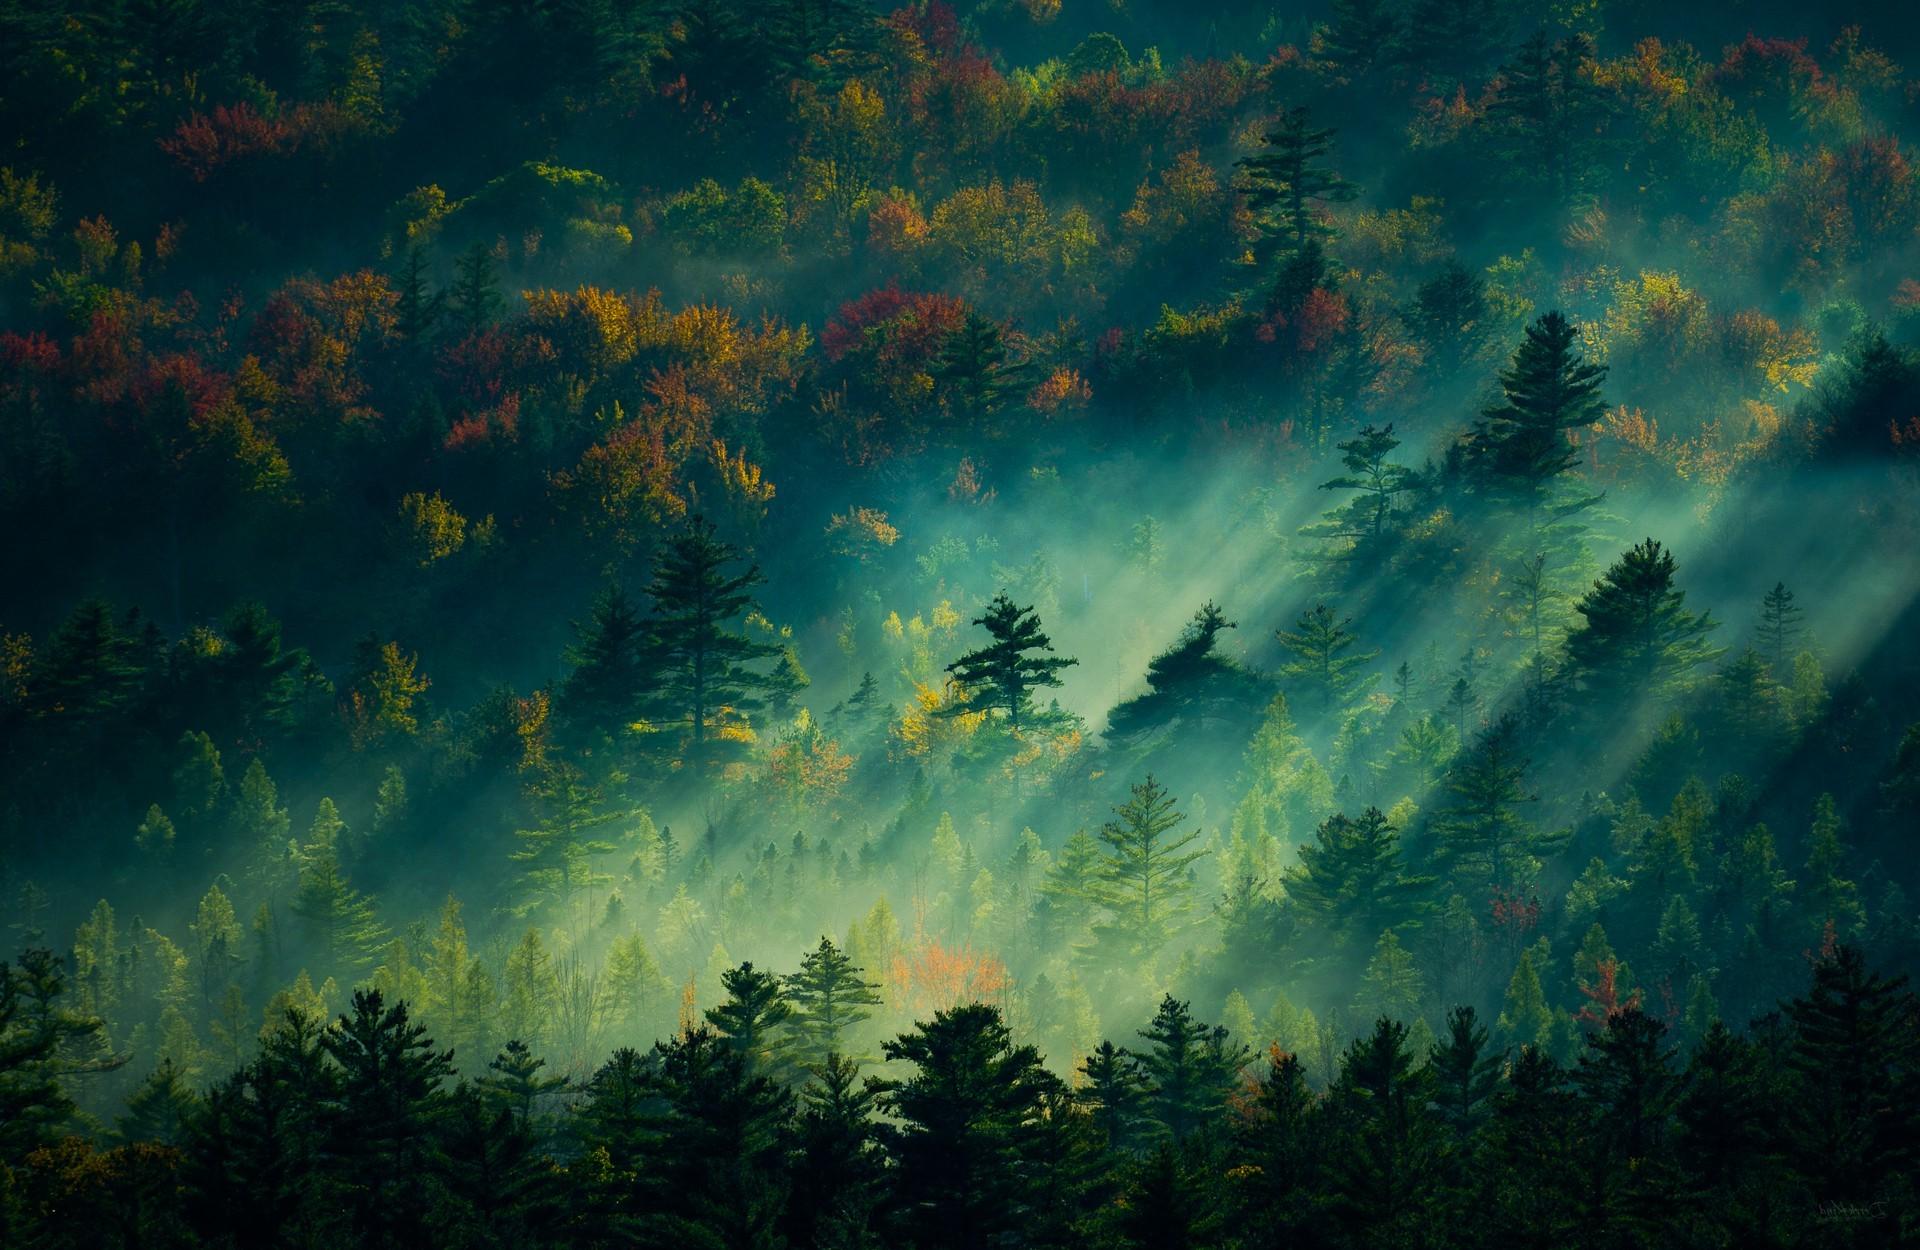 General 1920x1250 nature sunlight photography plants trees forest dappled sunlight mist fall